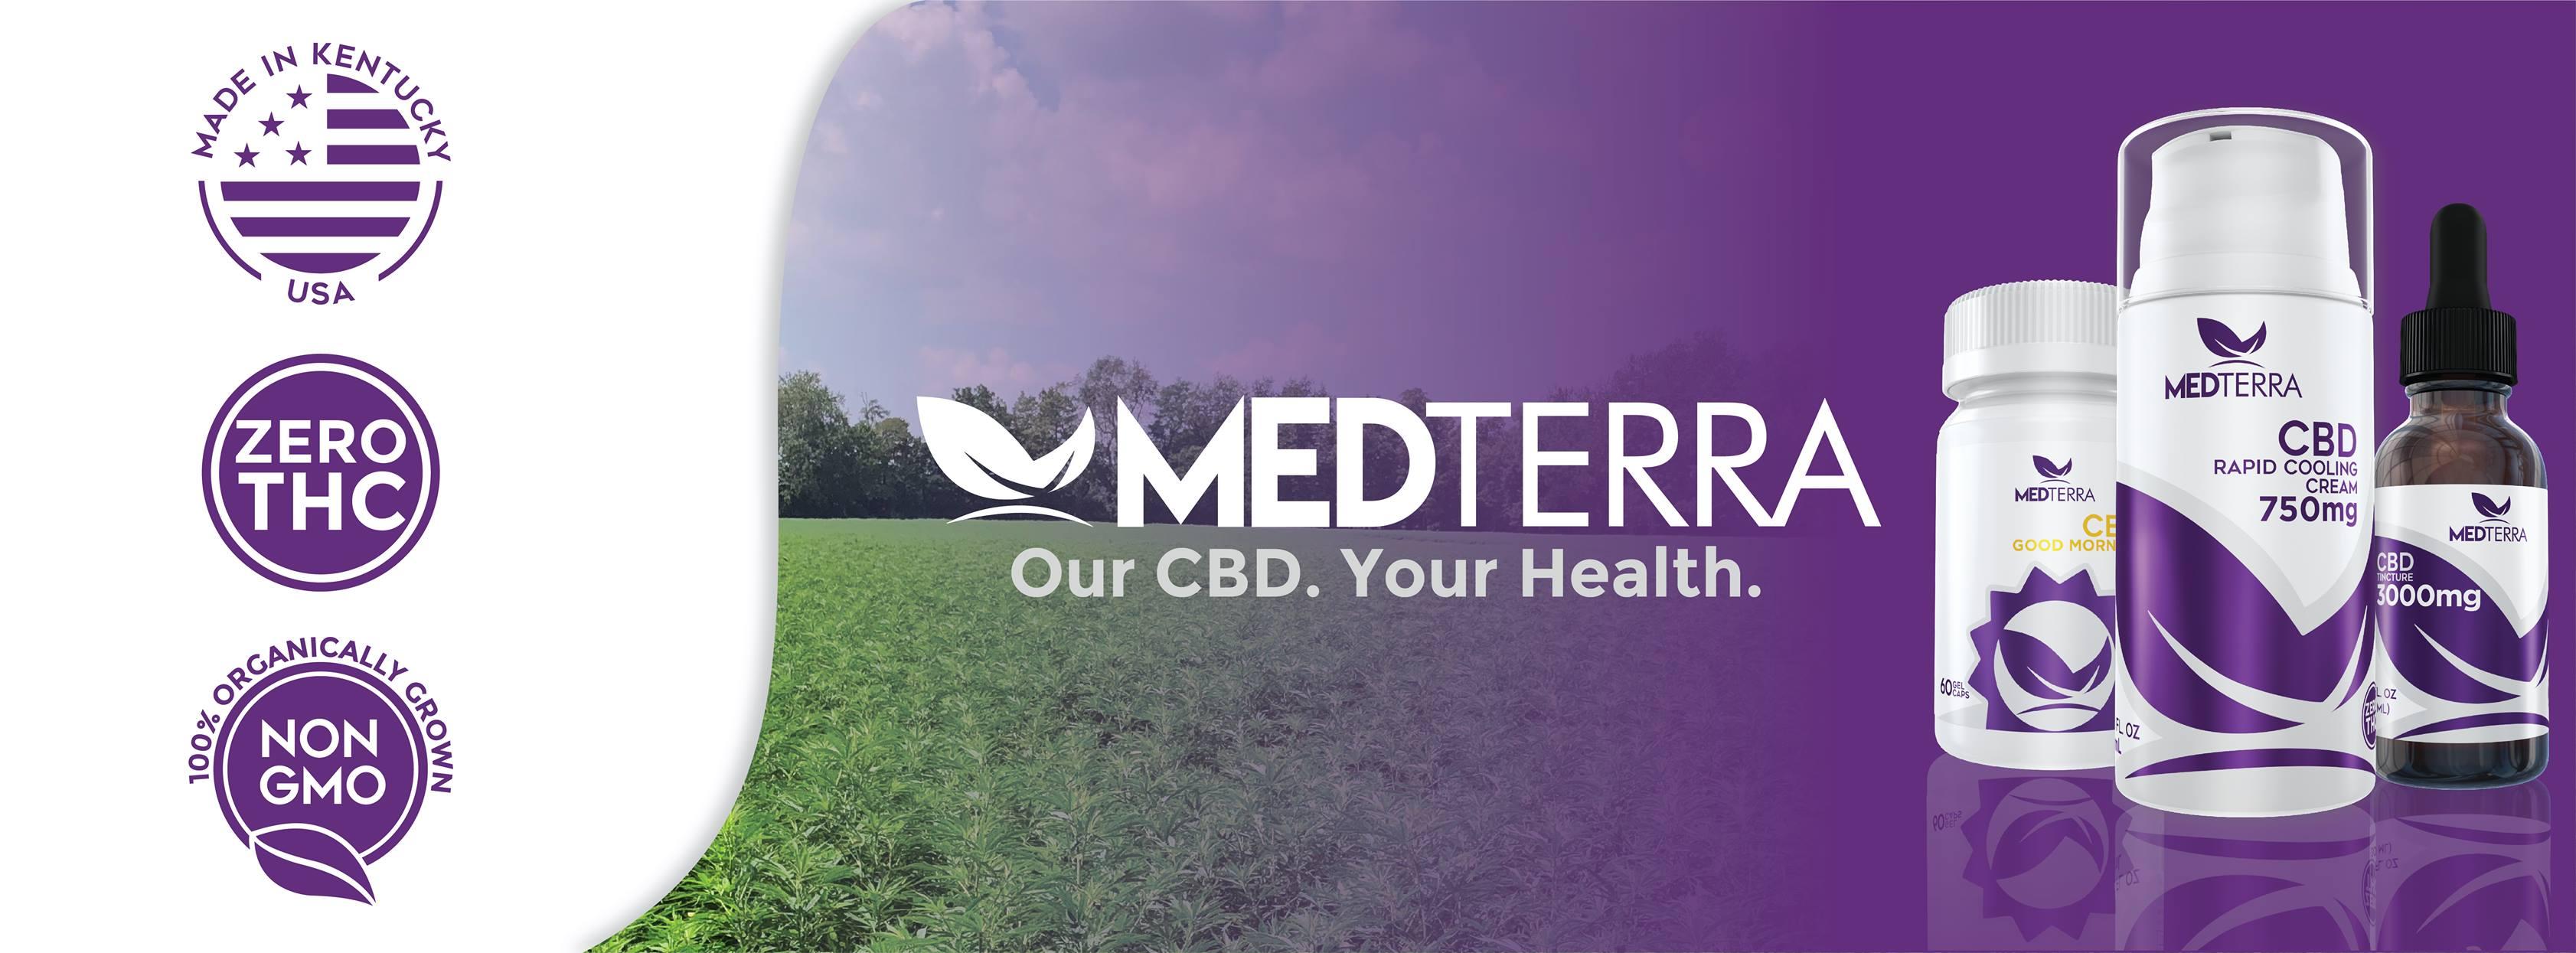 Medterra CBD reviews | Health & Medical at 9801 Research Dr - Irvine CA